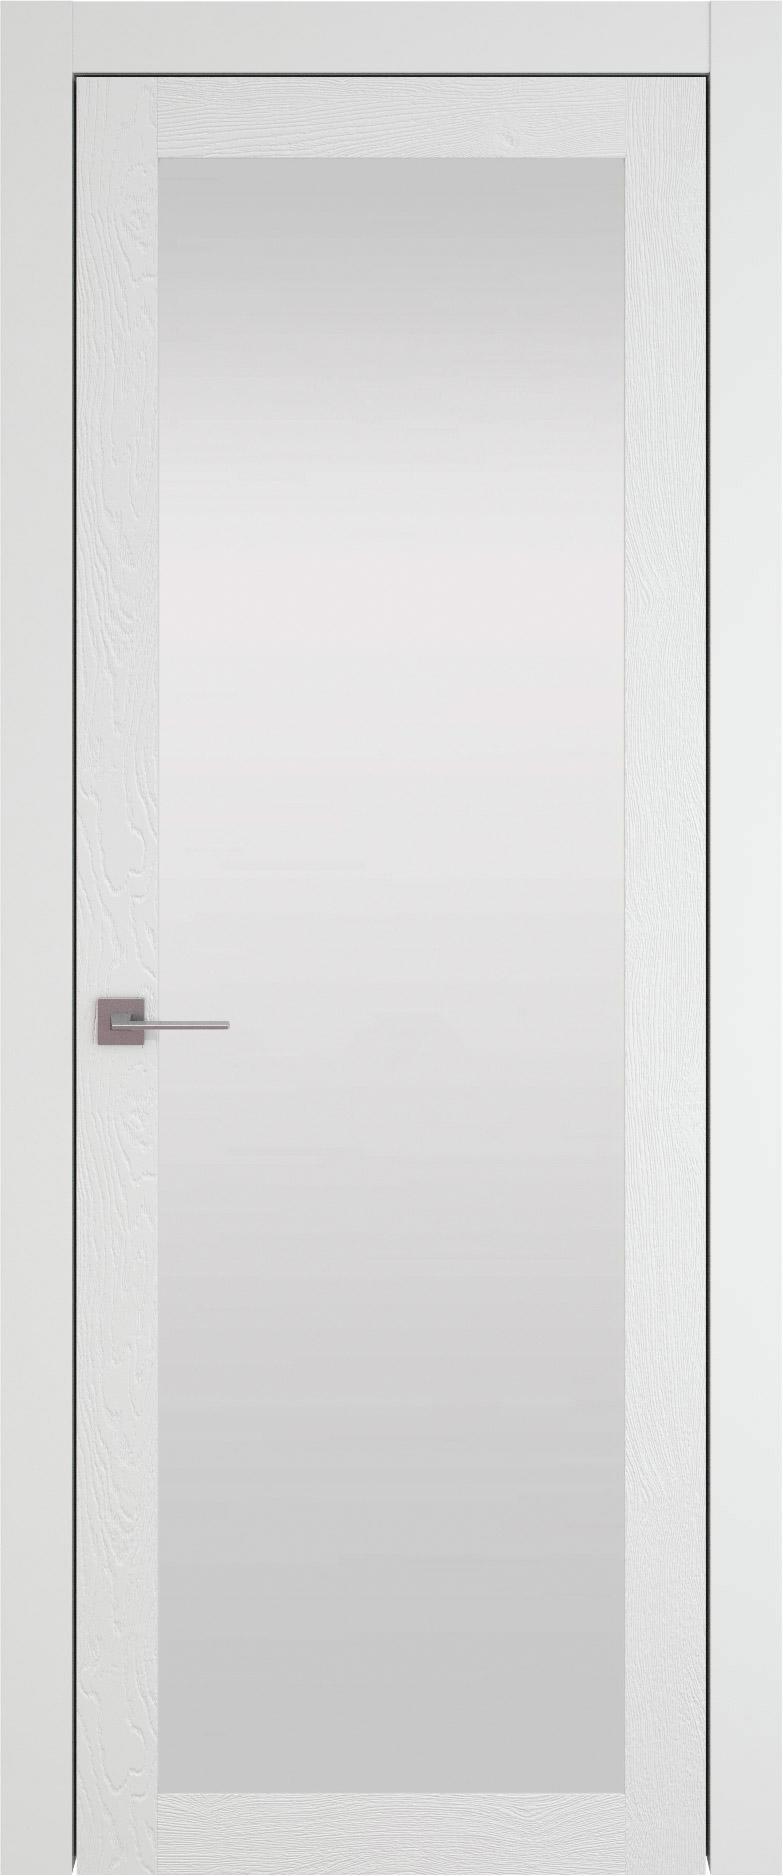 Tivoli З-1 цвет - Белая эмаль по шпону (RAL 9003) Со стеклом (ДО)